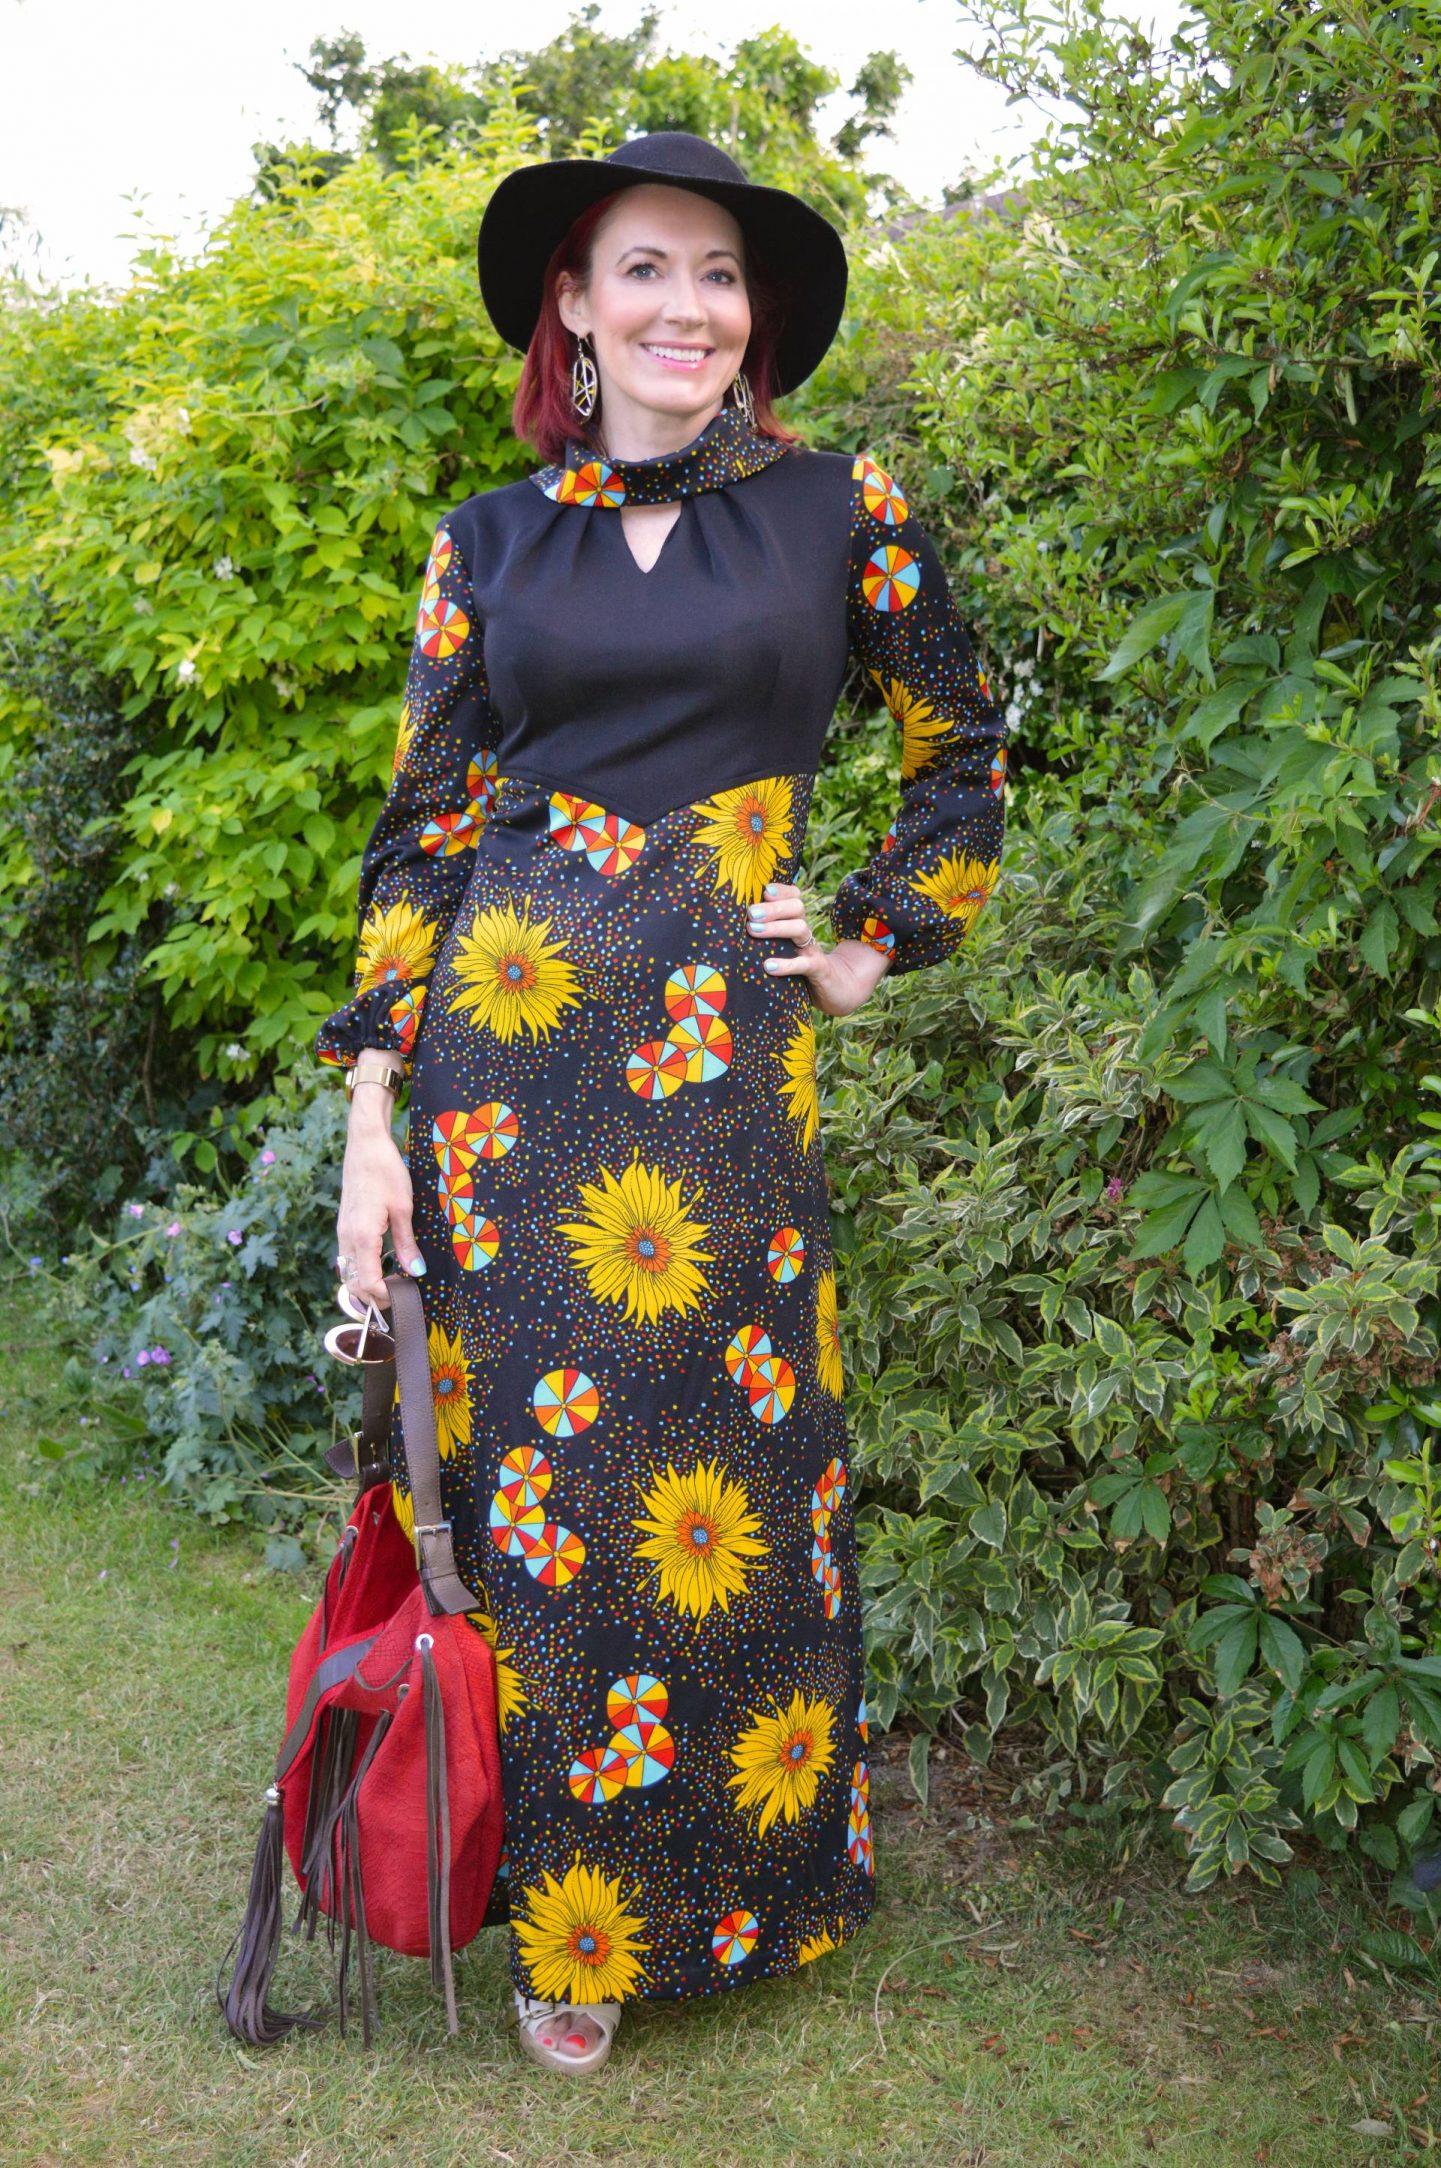 Boho Summer Style - June's Thrifty Six, black vintage flower print maxi dress